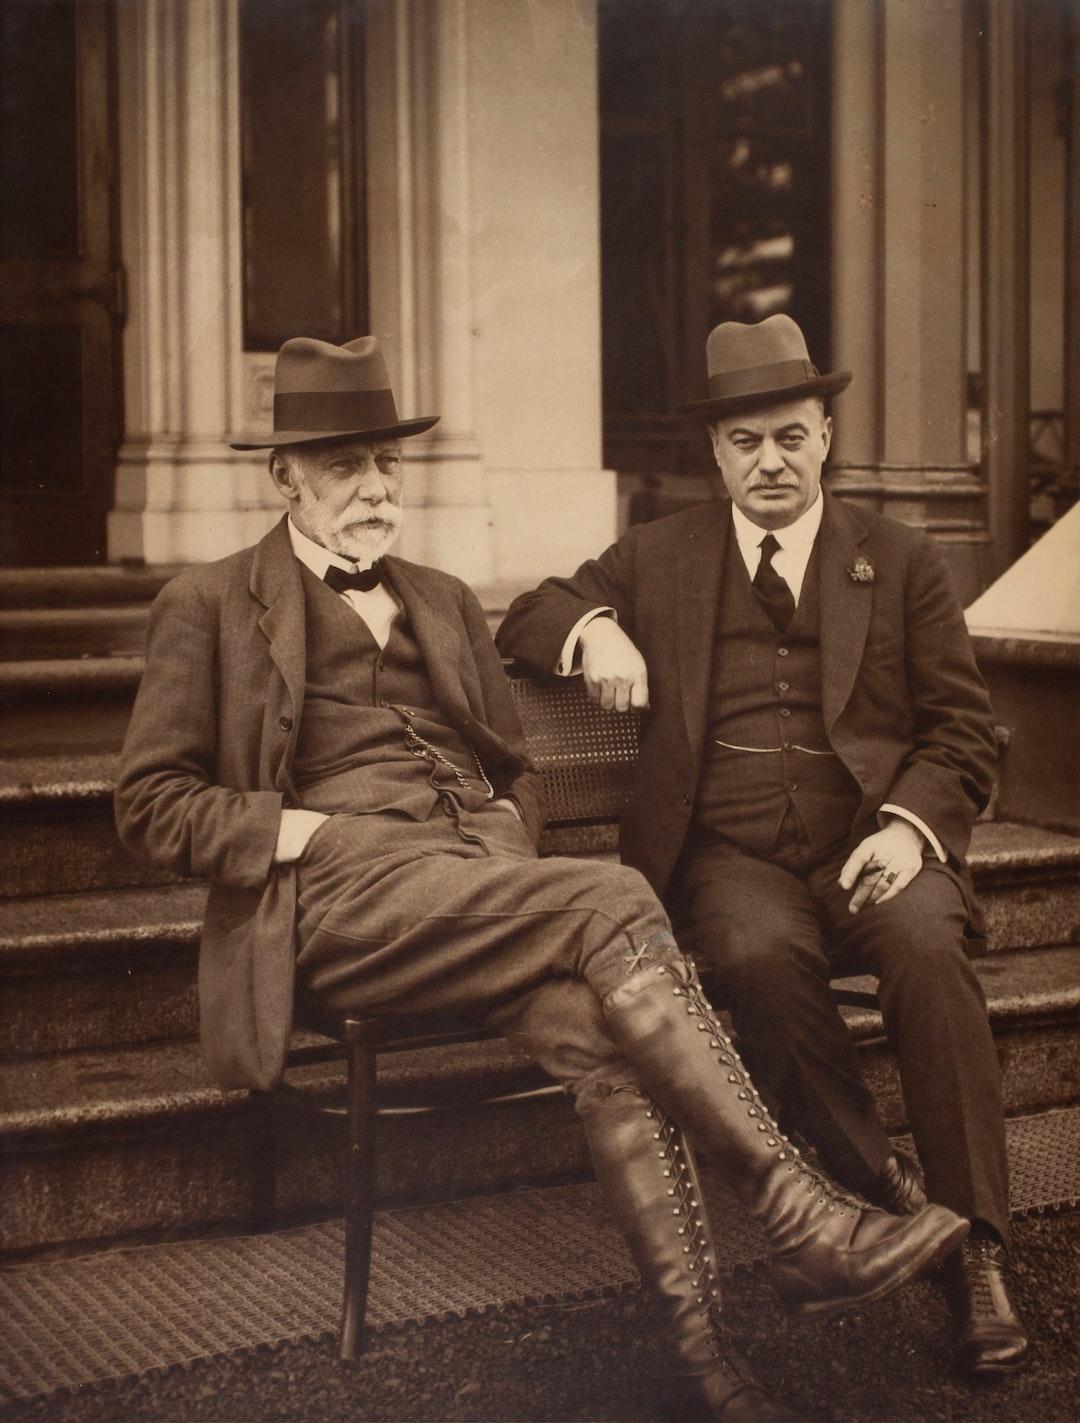 Thomas Baker and JJ Rouse, Kodak Australasia Pty Ltd, Abbotsford